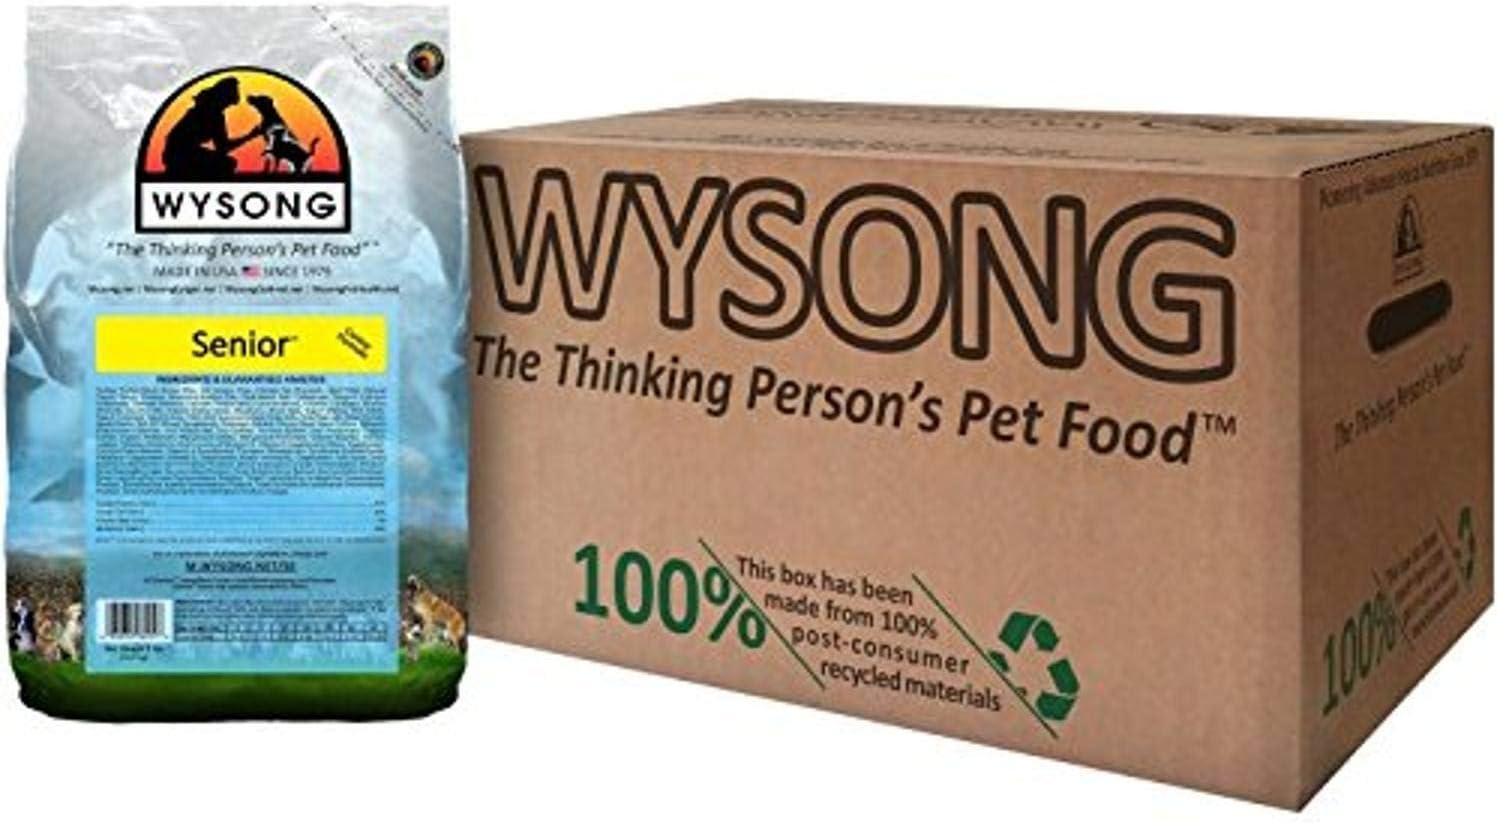 Wysong Senior Canine Formula - Dry Diet Senior Dog Food, Four- 5 Pound Bag (858012)